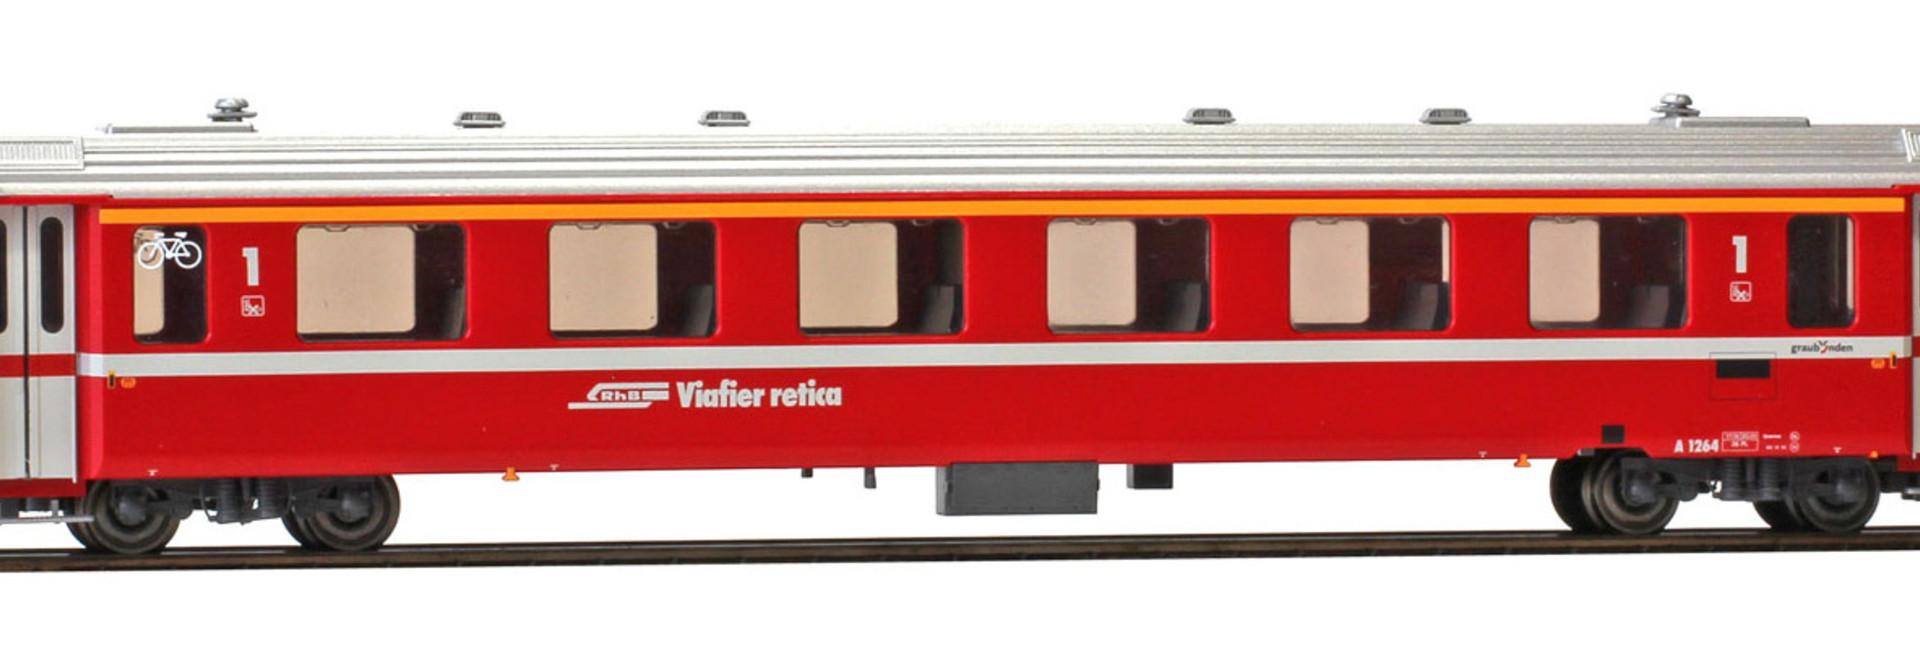 3242164 RhB A 1264 Einheitswagen II neurot